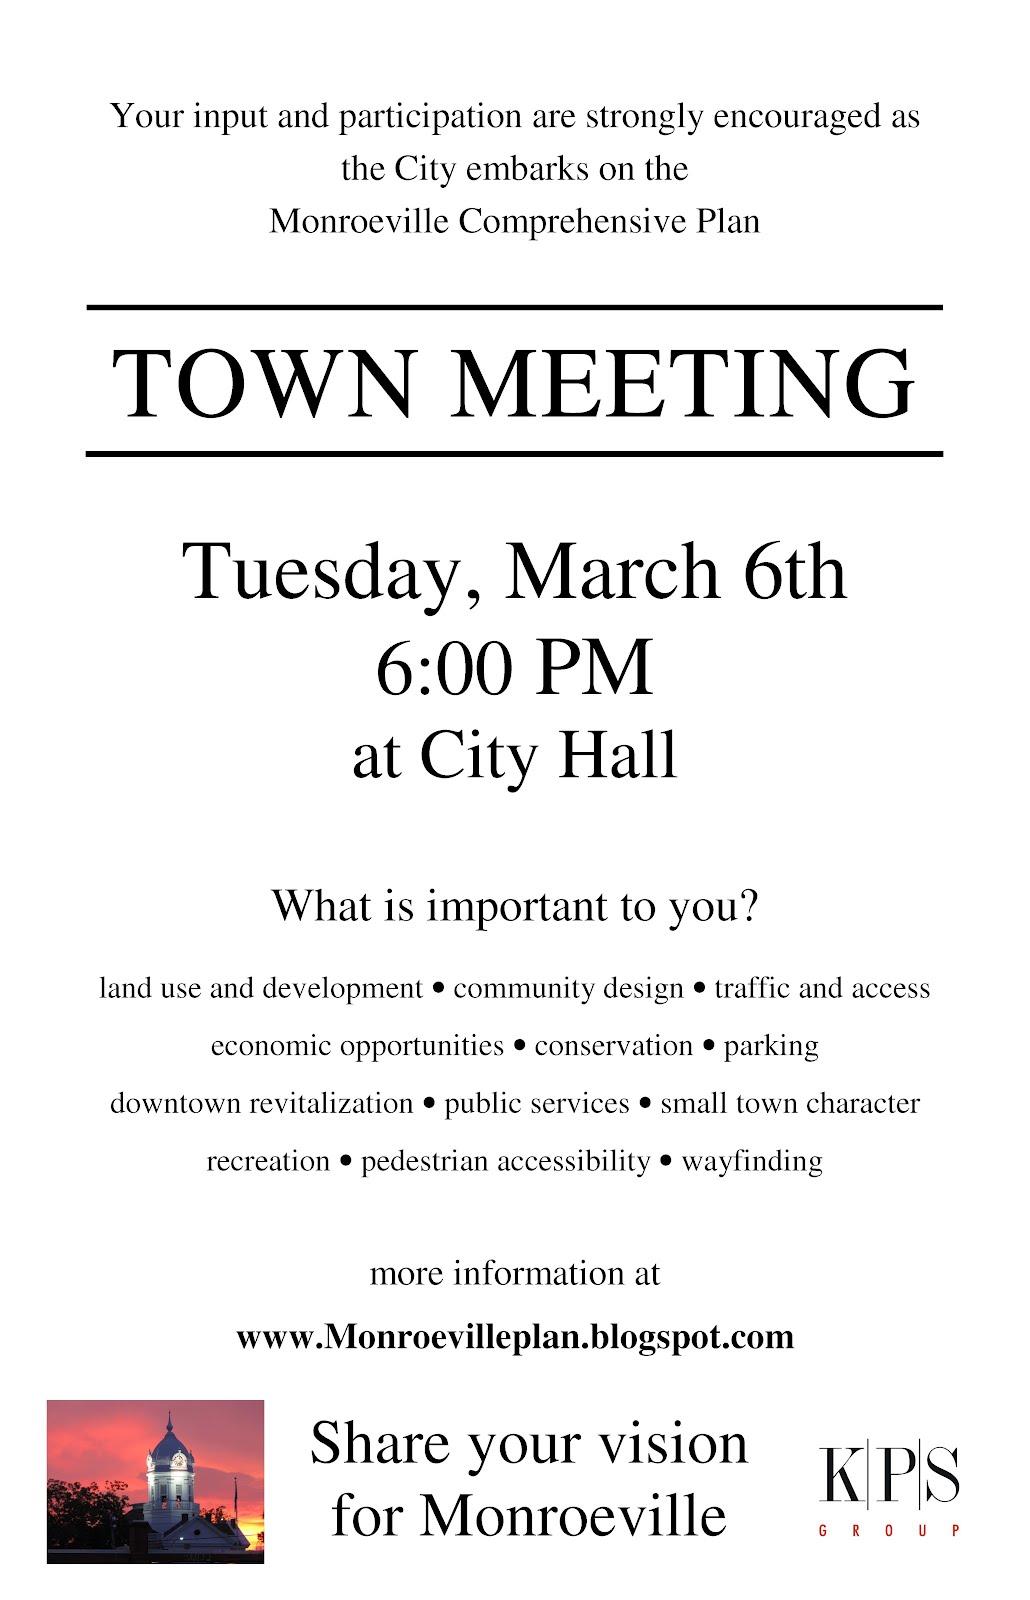 Monroeville Comprehensive Plan